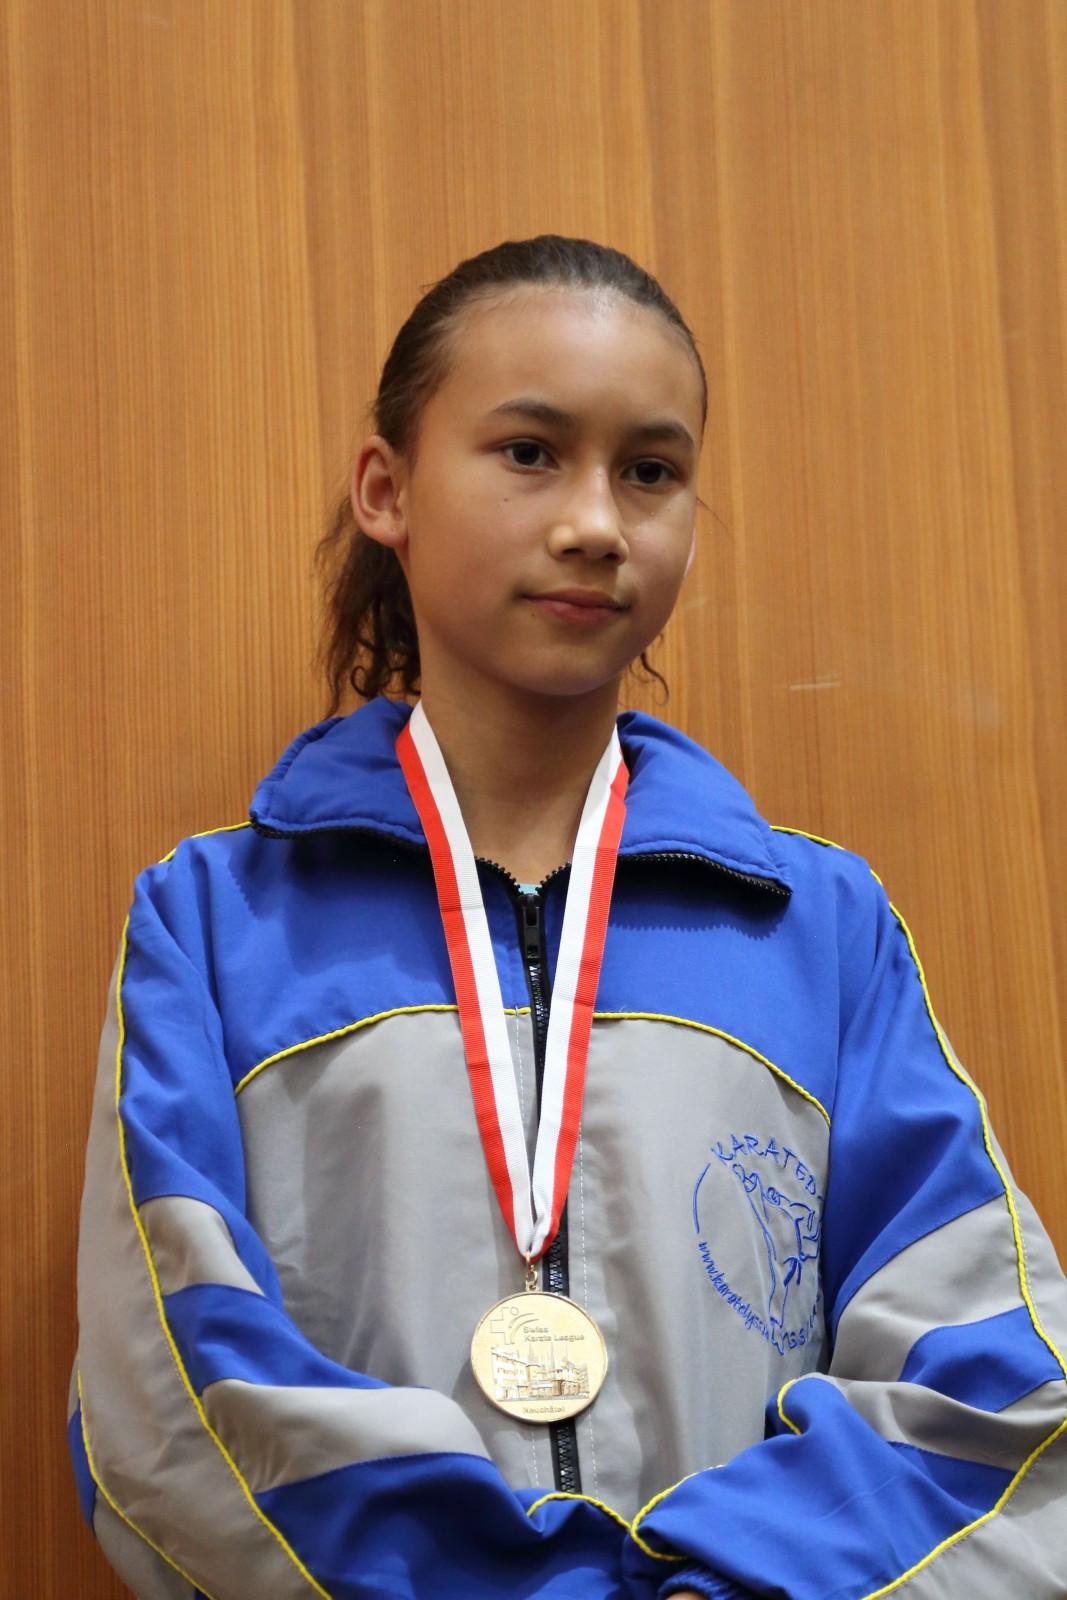 Jasmin Bailif